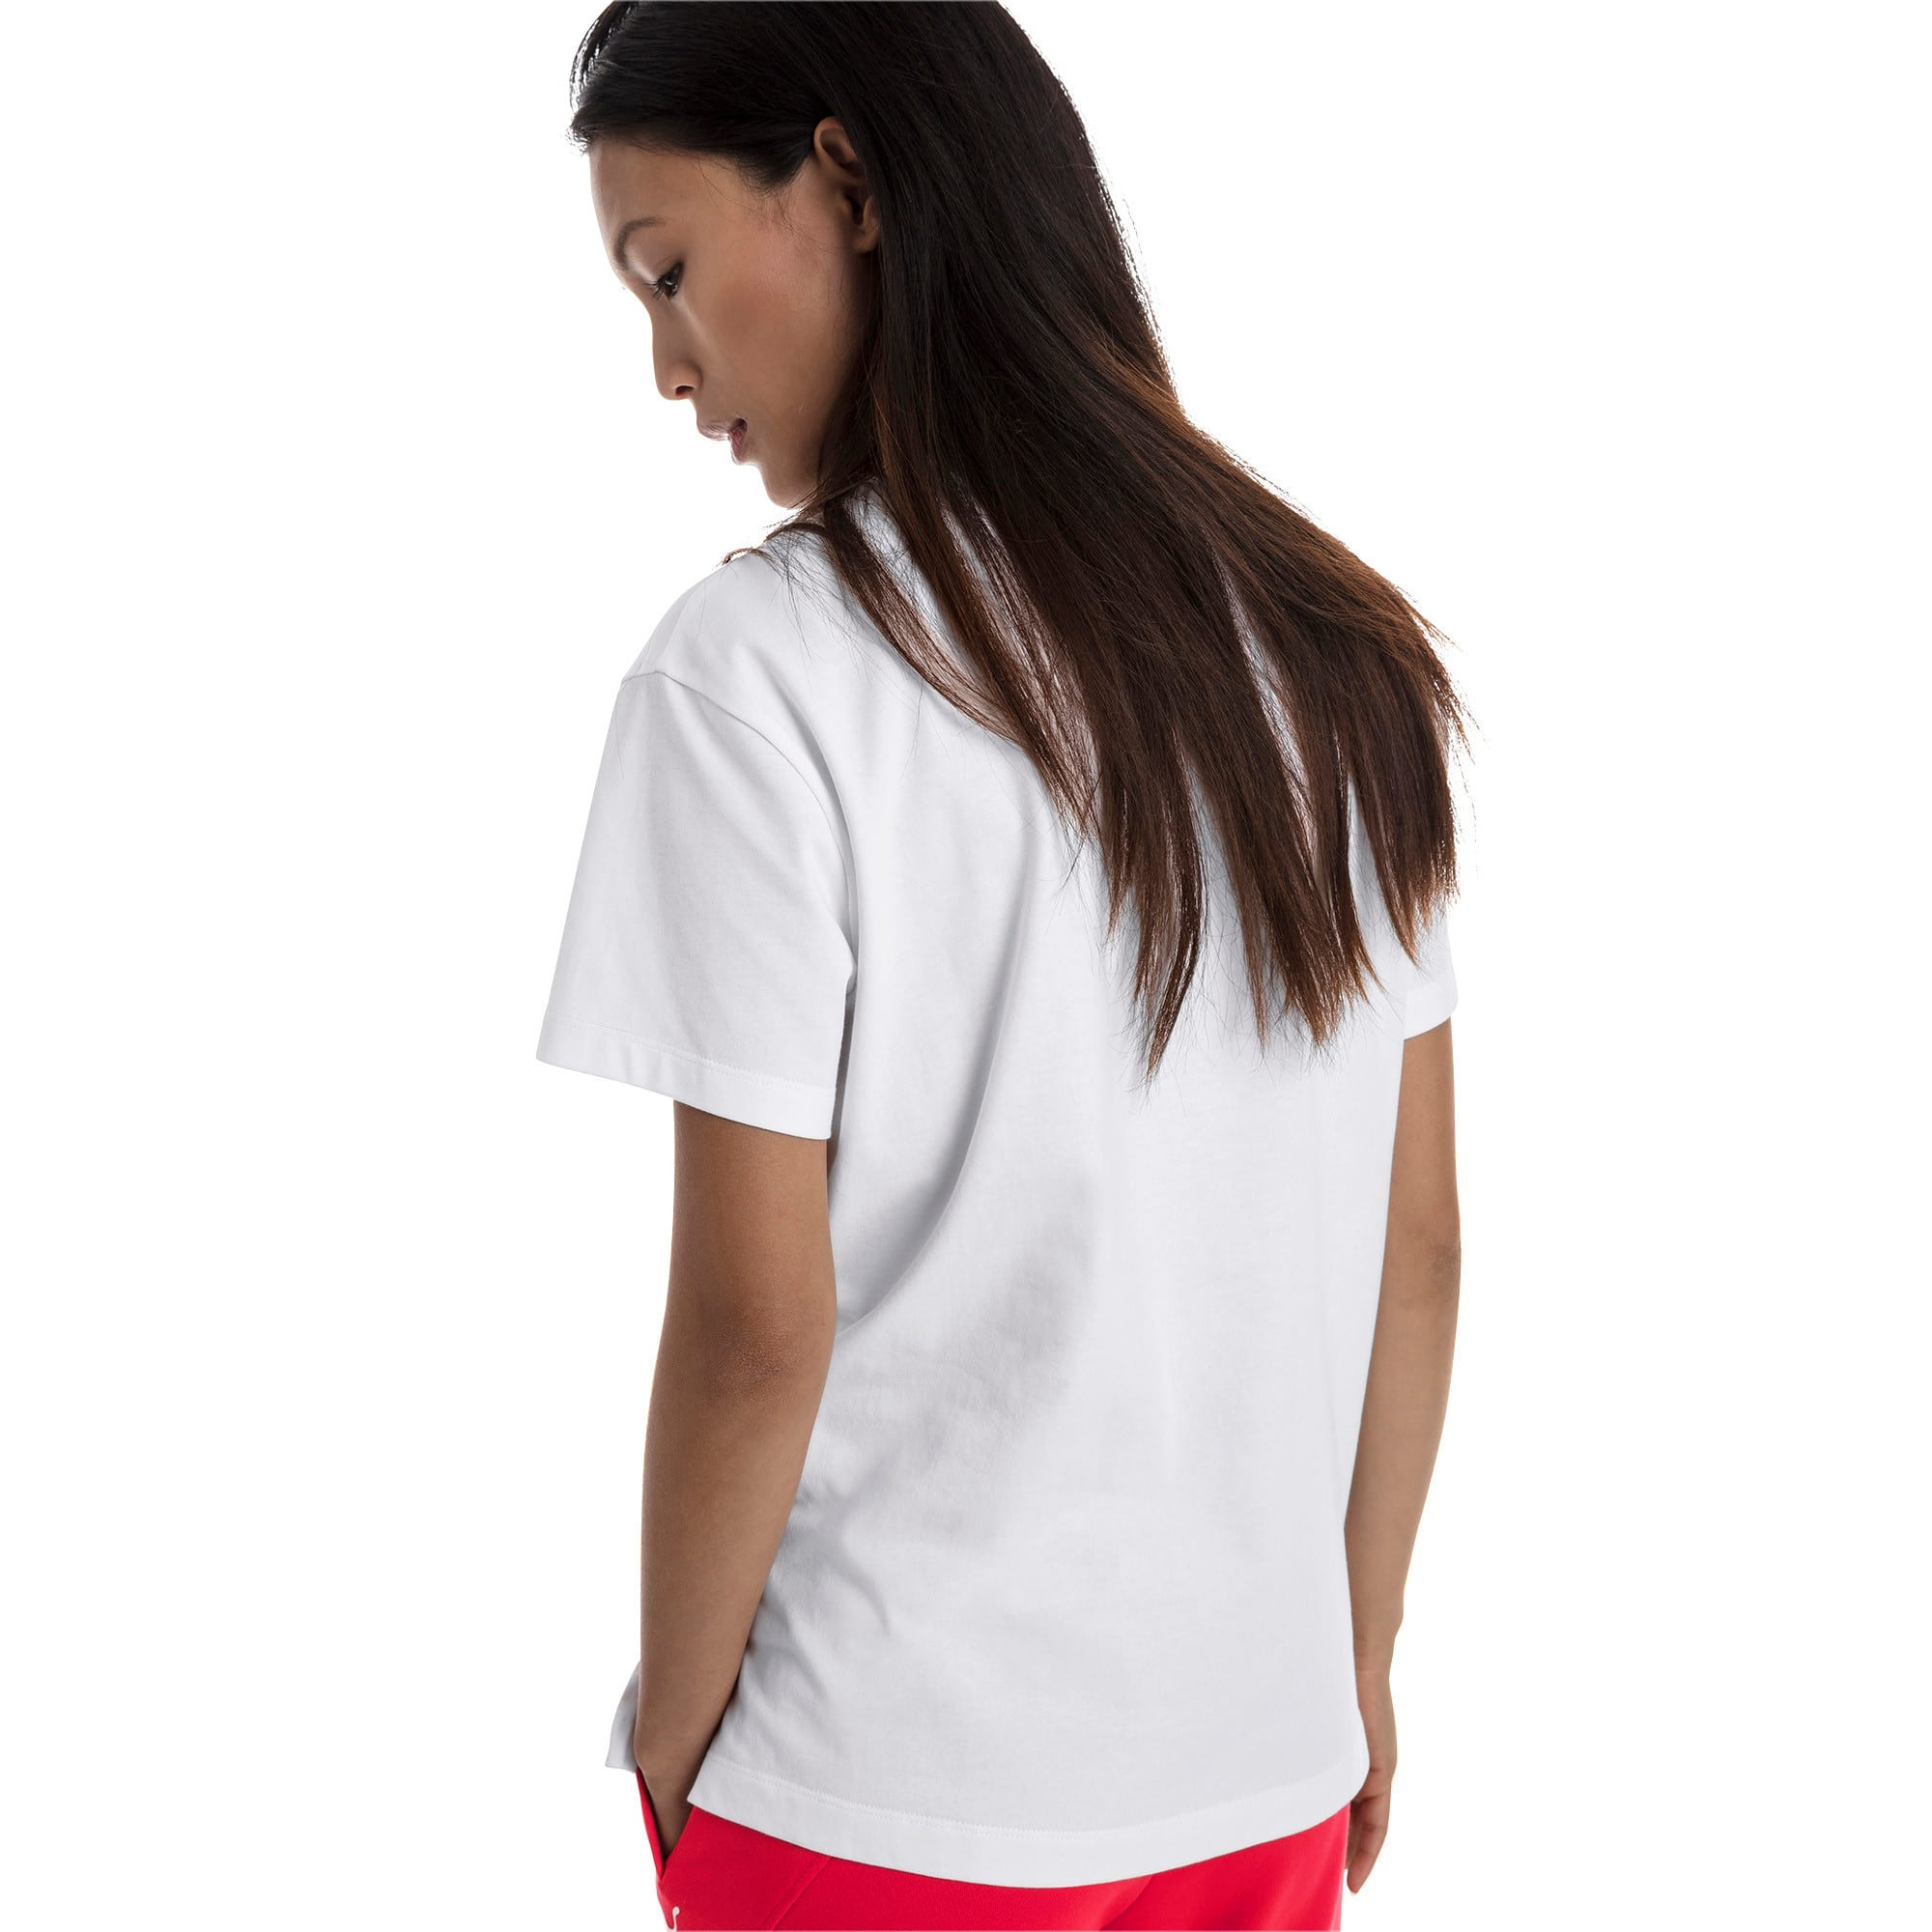 Thumbnail 3 of CLASSICS ロゴ ウィメンズ SS Tシャツ 半袖, Puma White-metal, medium-JPN